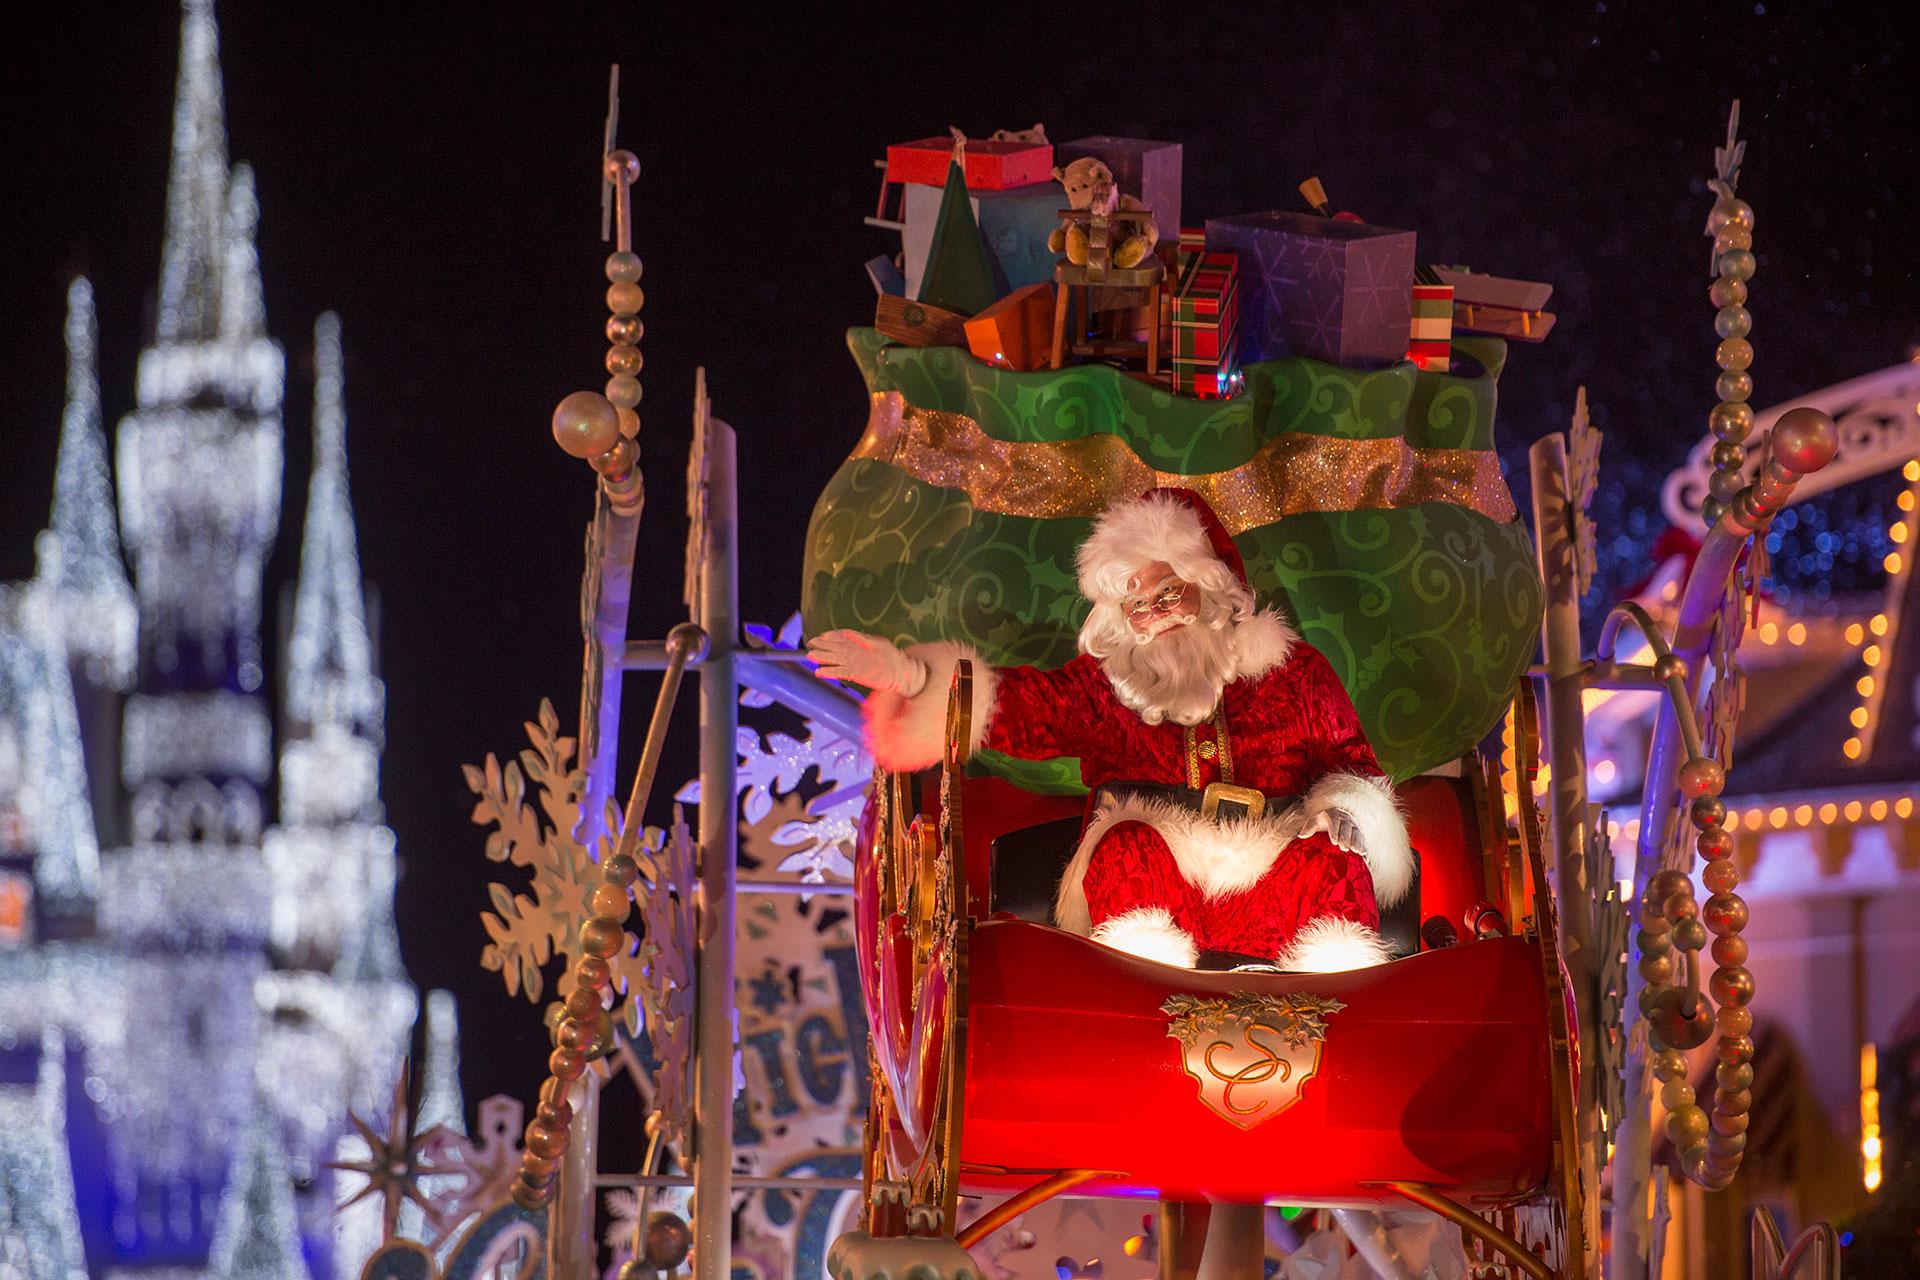 Santa in Holiday Parade at Mickey's Very Merry Christmas Party in Disney World; Courtesy of Disney